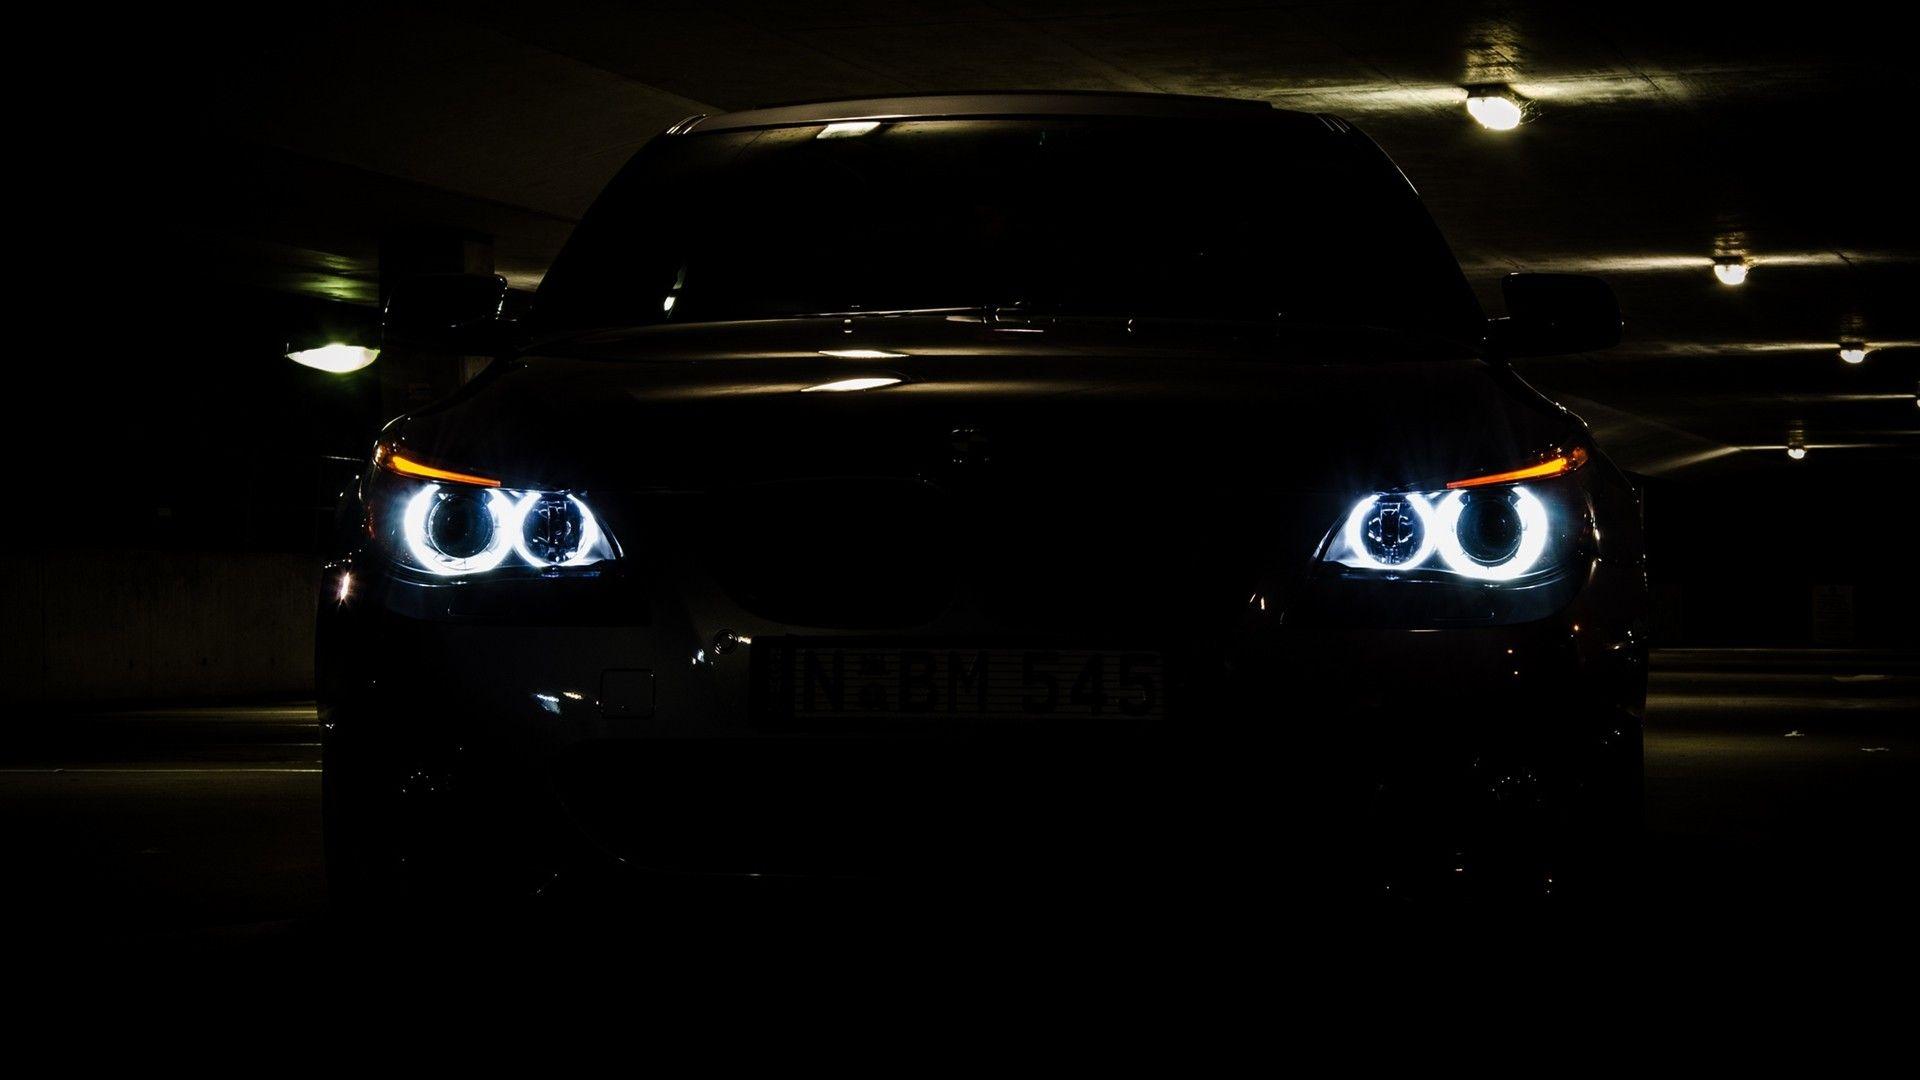 Angel Eyes Bmw Bmw 5 Series Bmw E60 Automobile Wallpaper 2621020